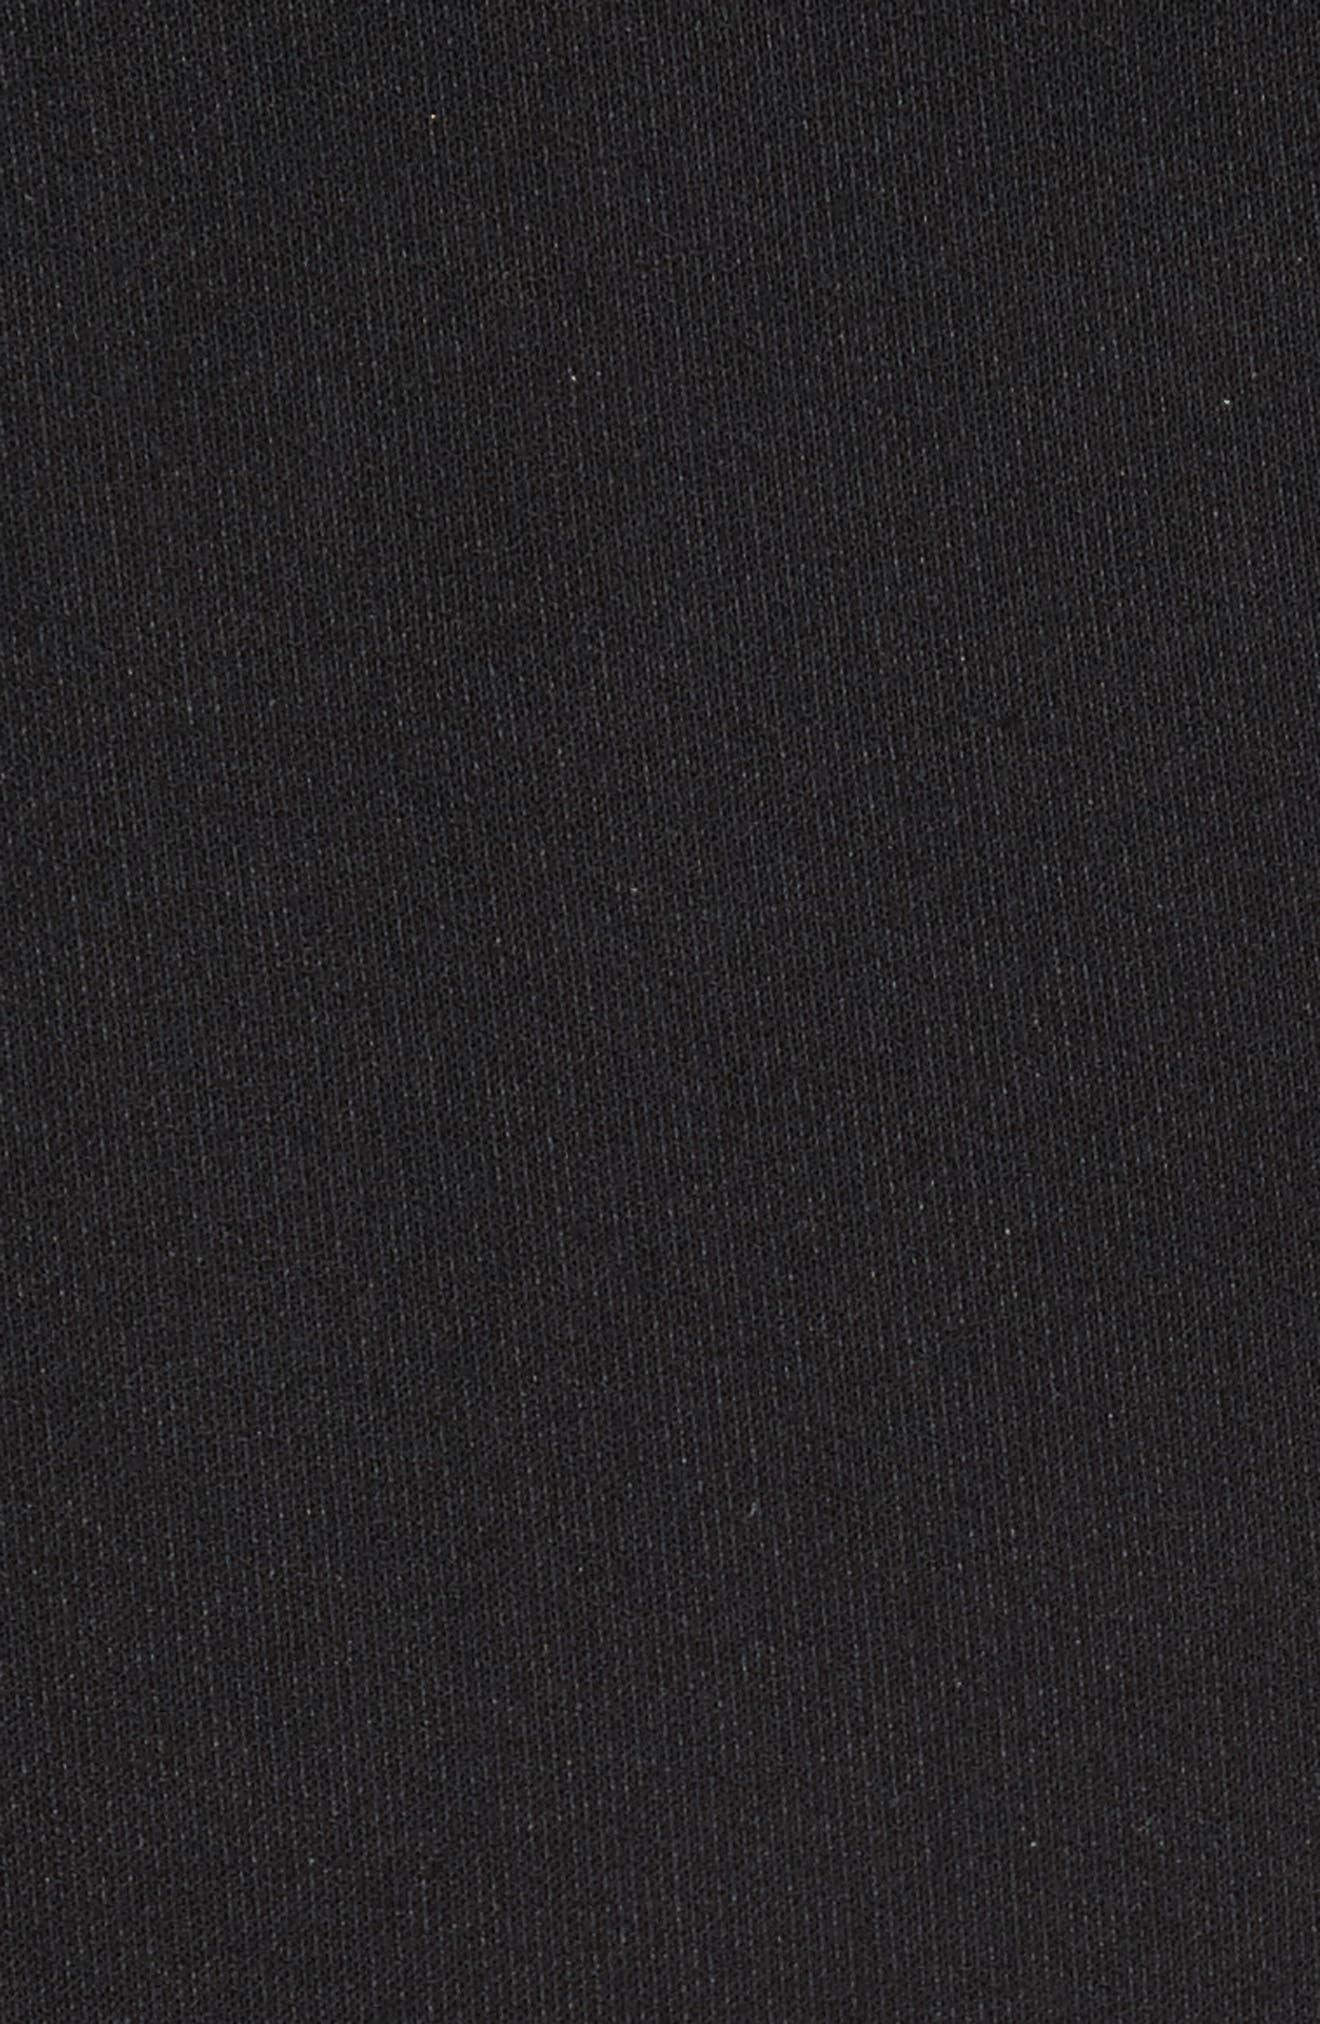 Seneca Flare Leg Crop Pants,                             Alternate thumbnail 5, color,                             Black